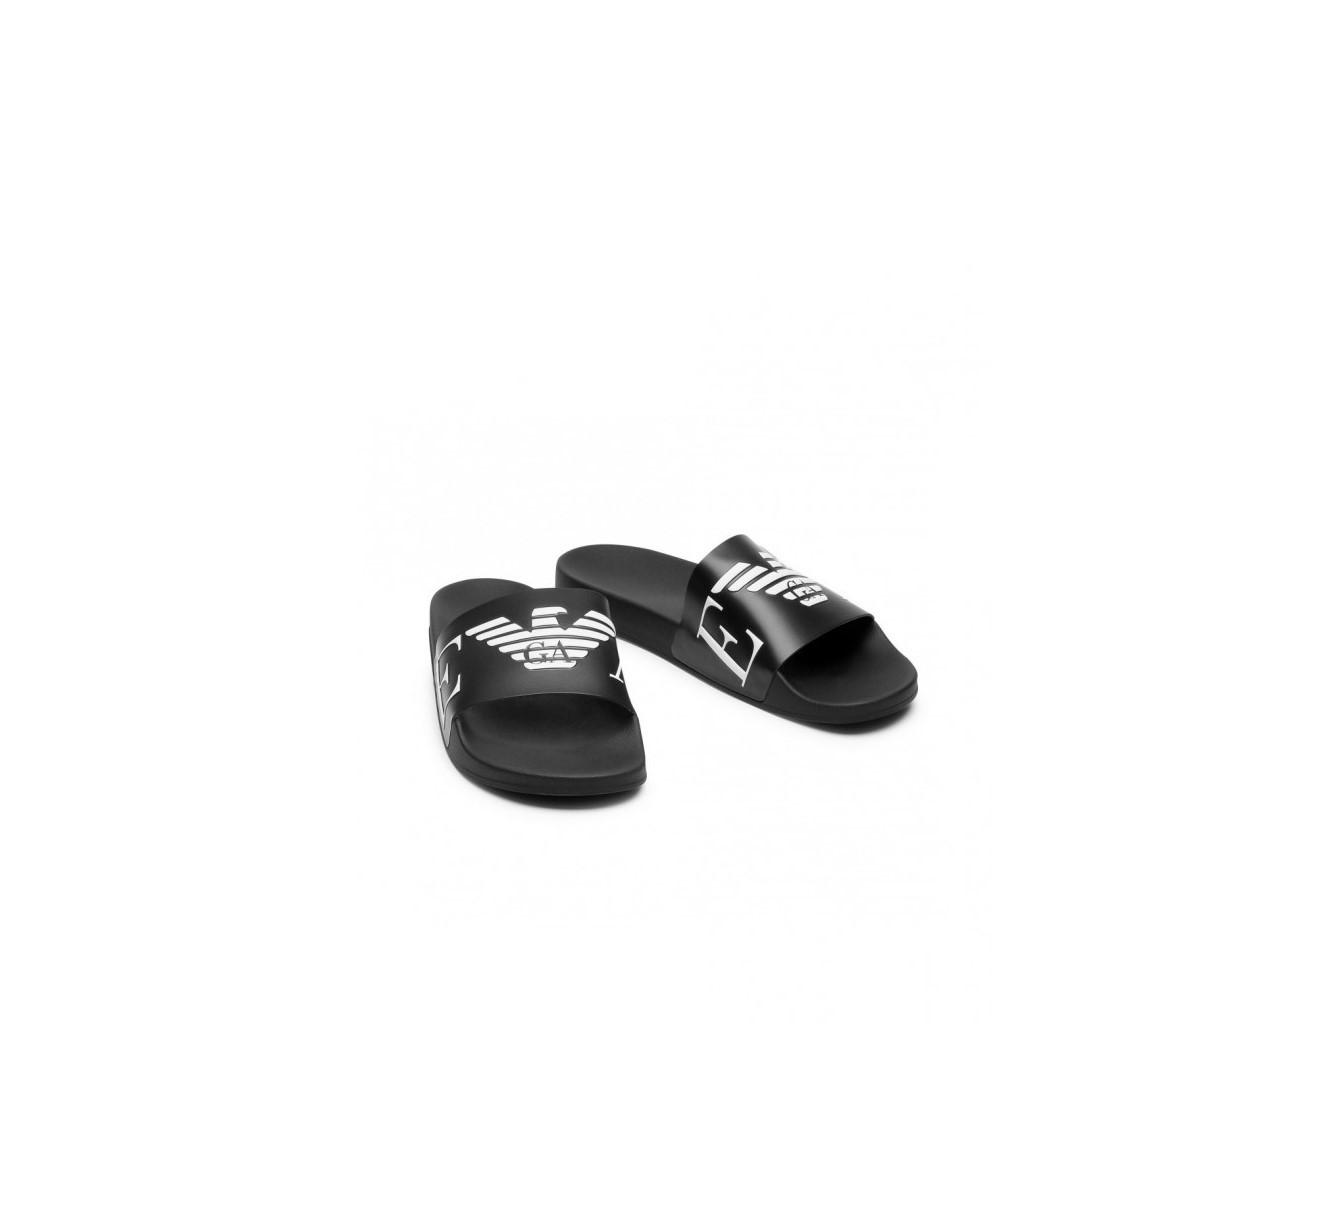 Armani Emporio Armani pánské černé pantofle